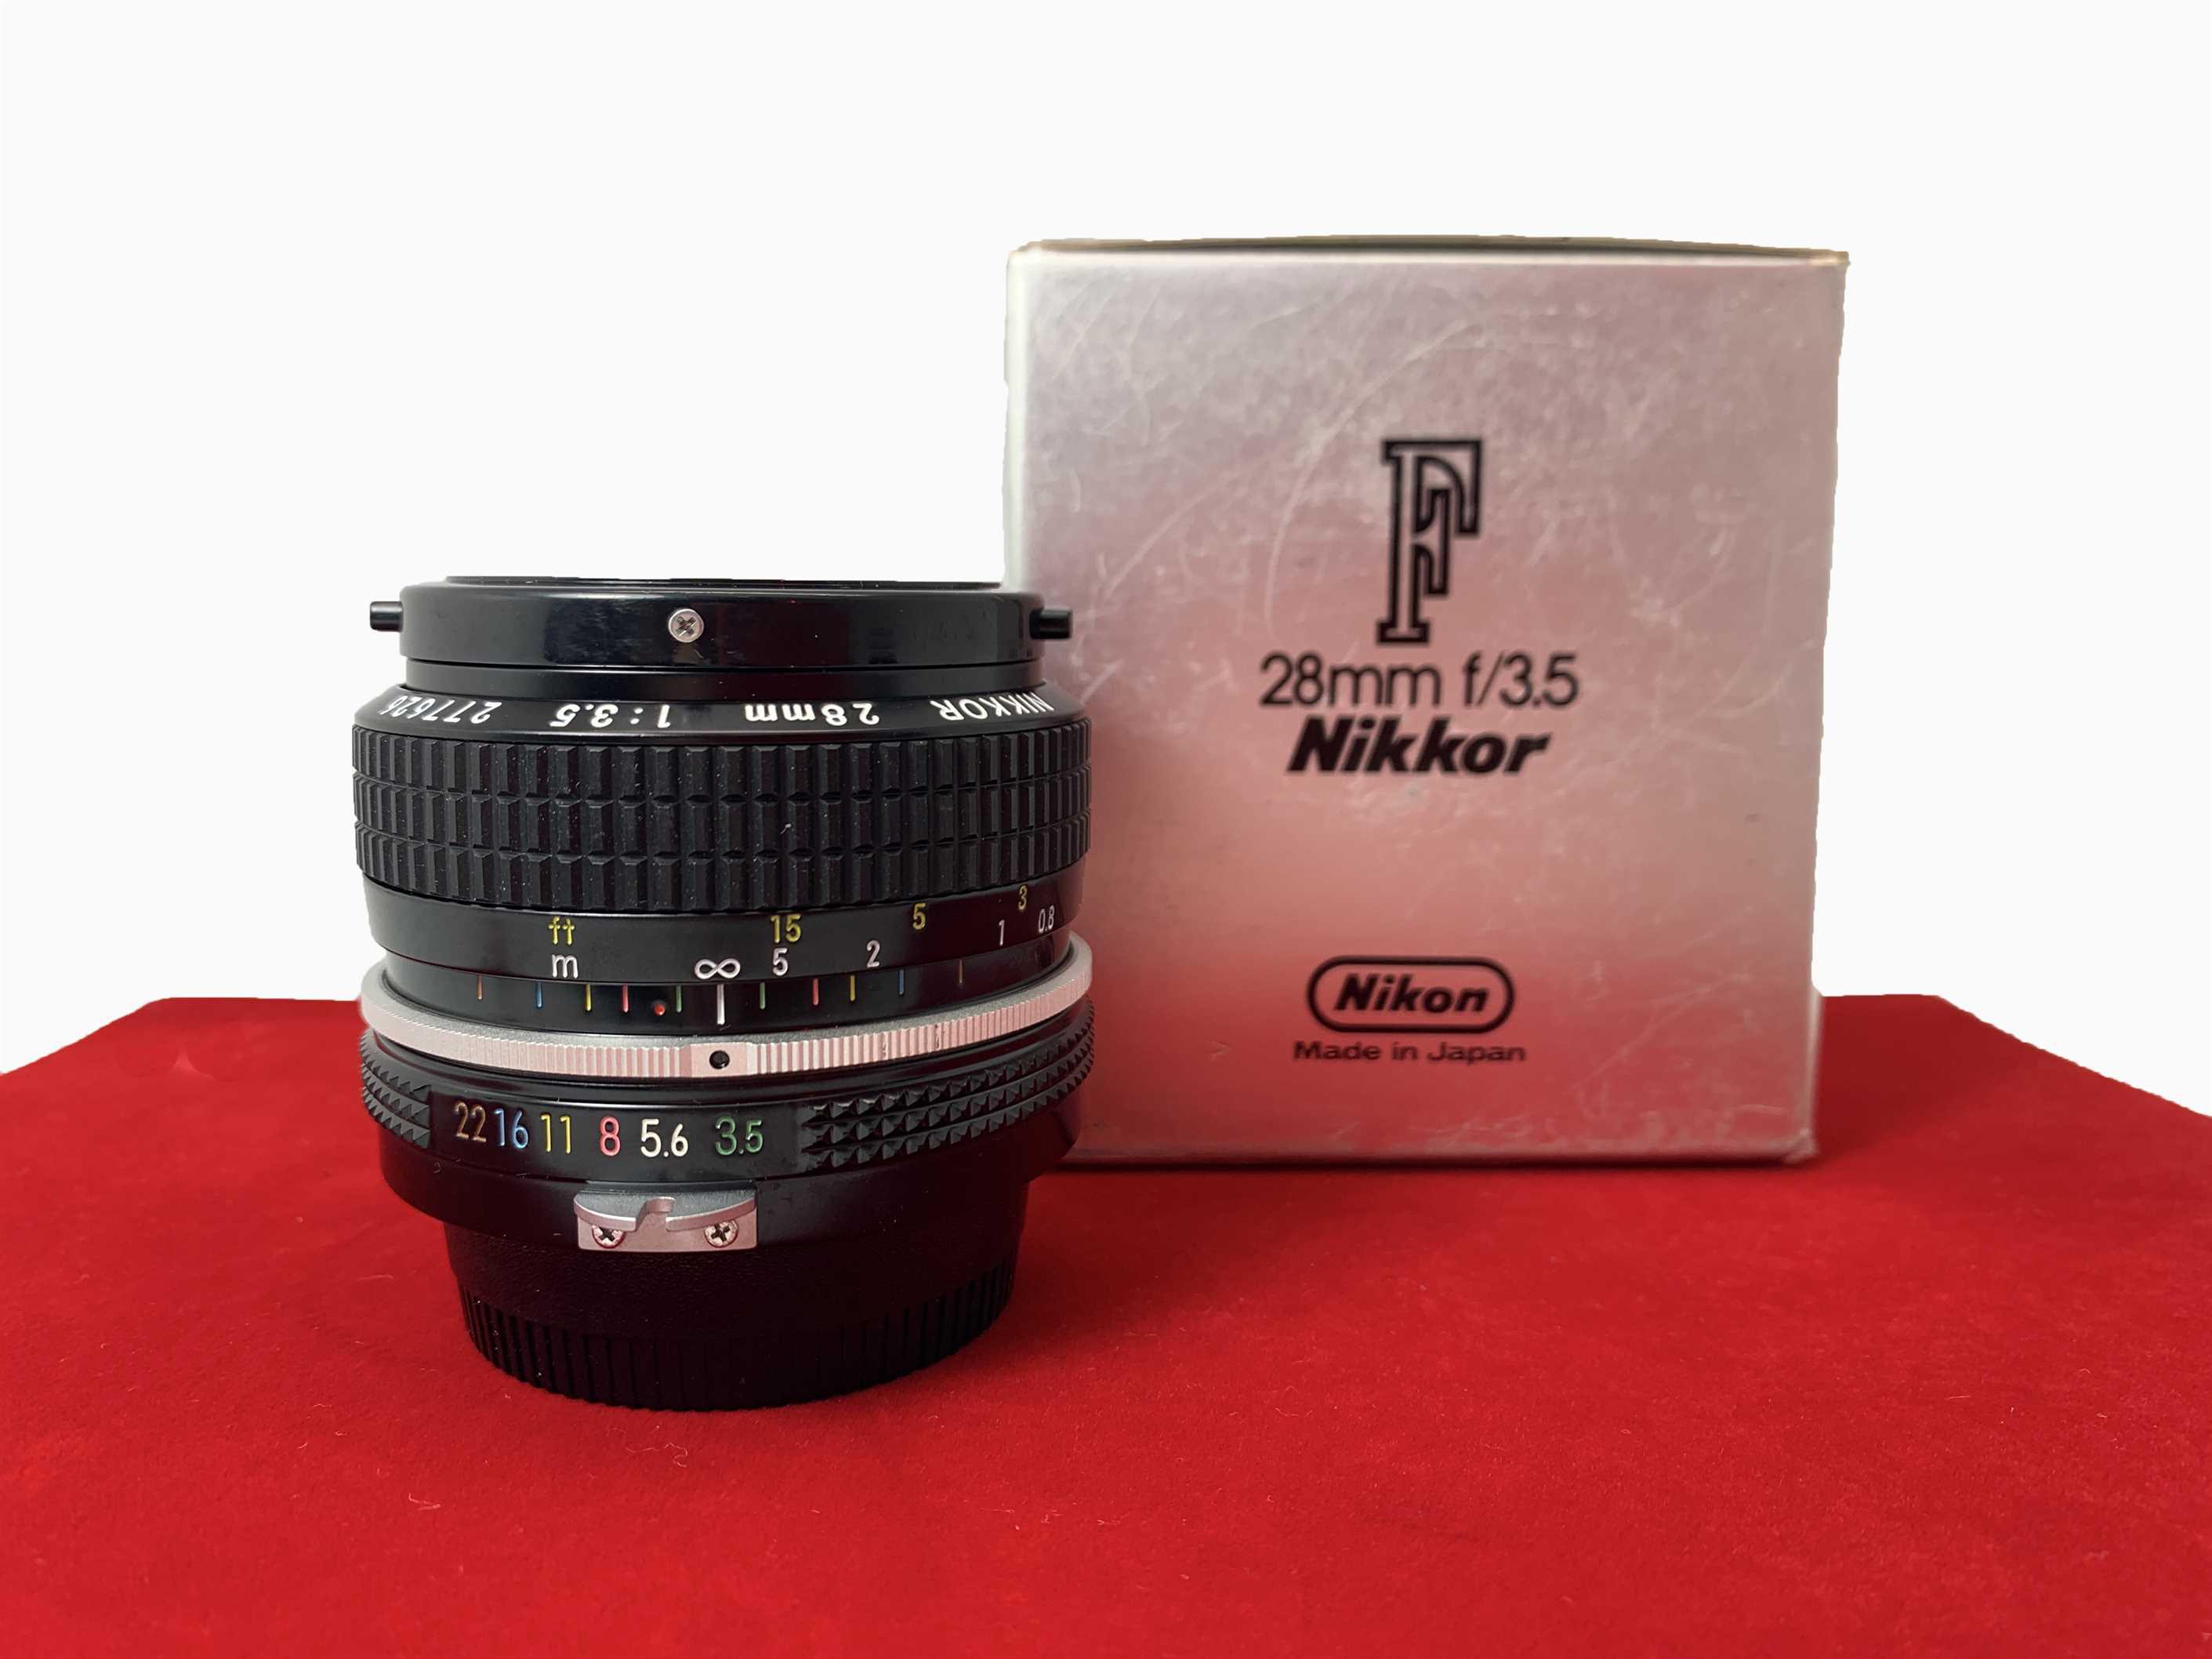 [USED-PJ33] Nikon 28mm F3.5,99% Like New Condition (S/N:277626)